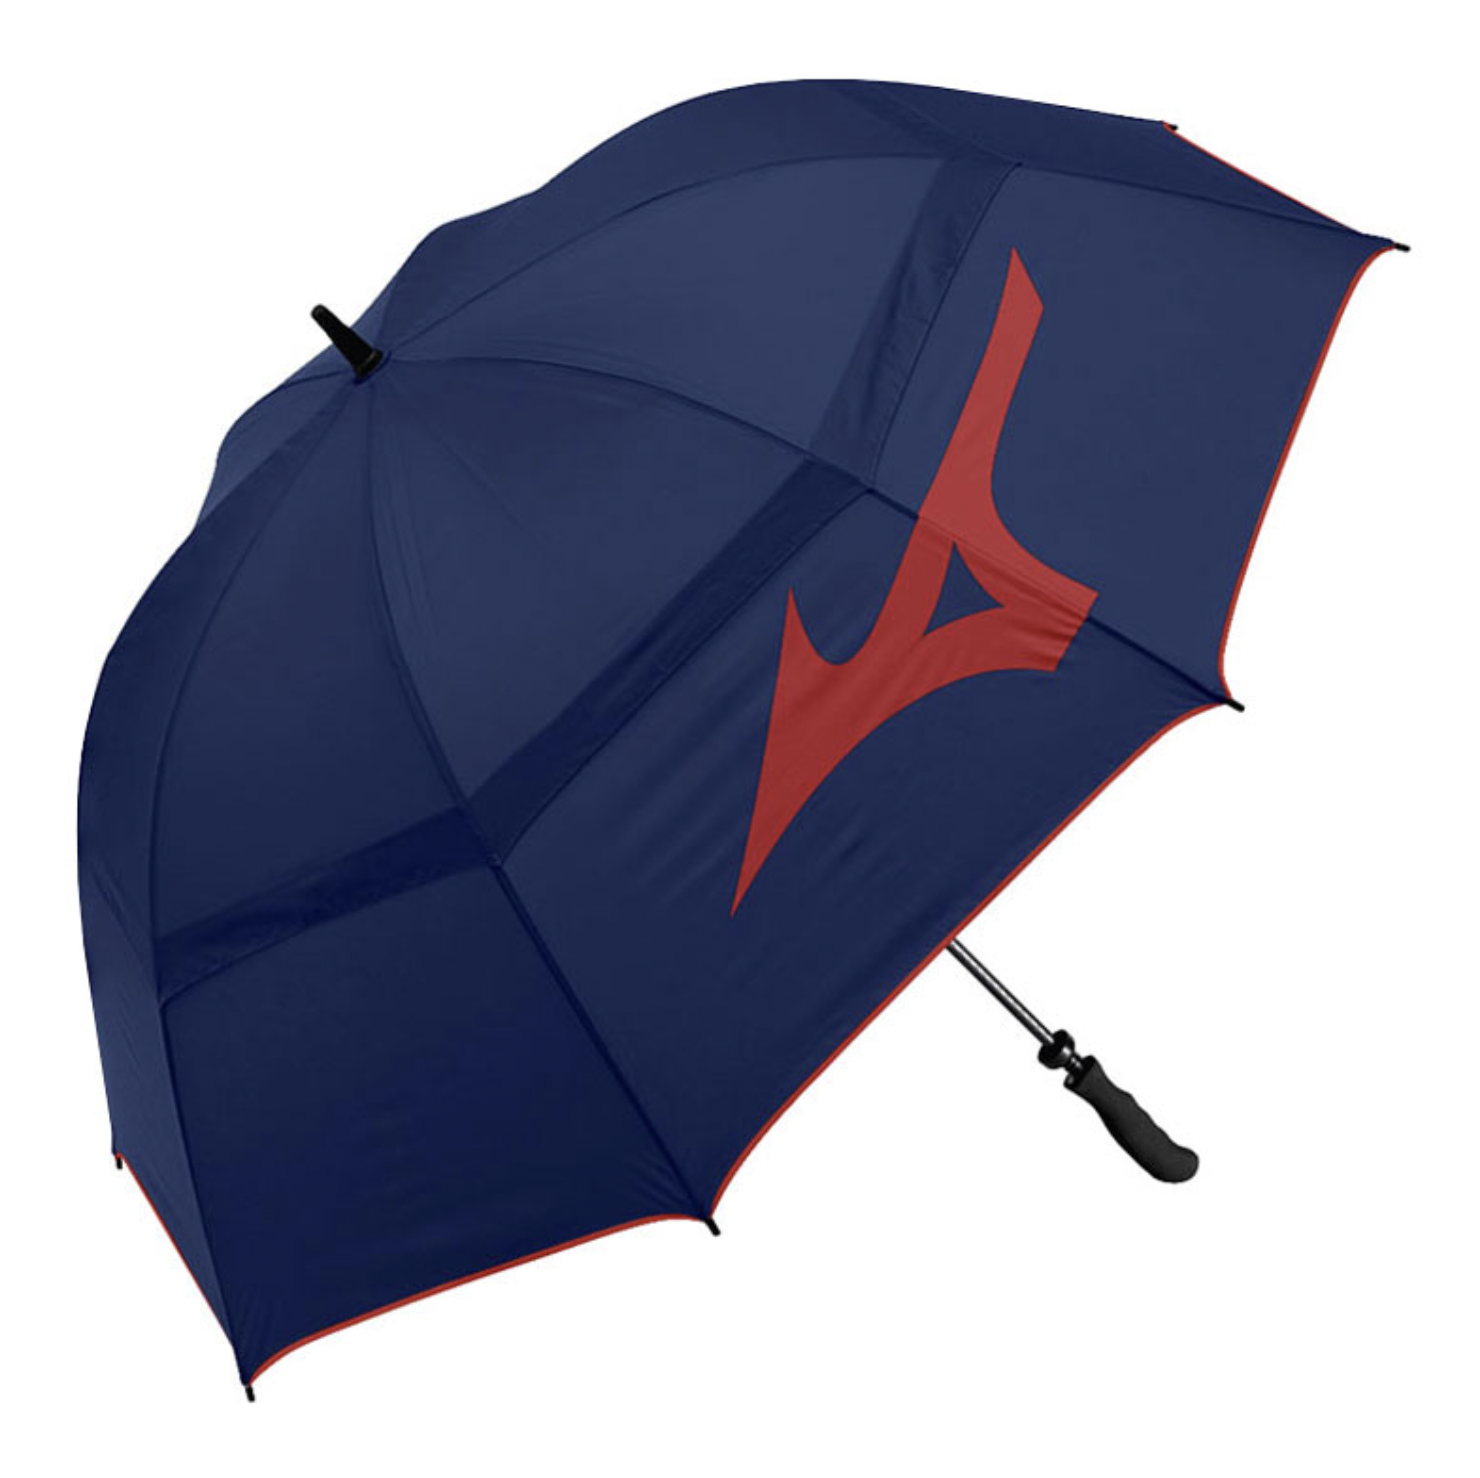 Mizuno Mizuno Tour Twin Canopy Golf Paraplu, Navy